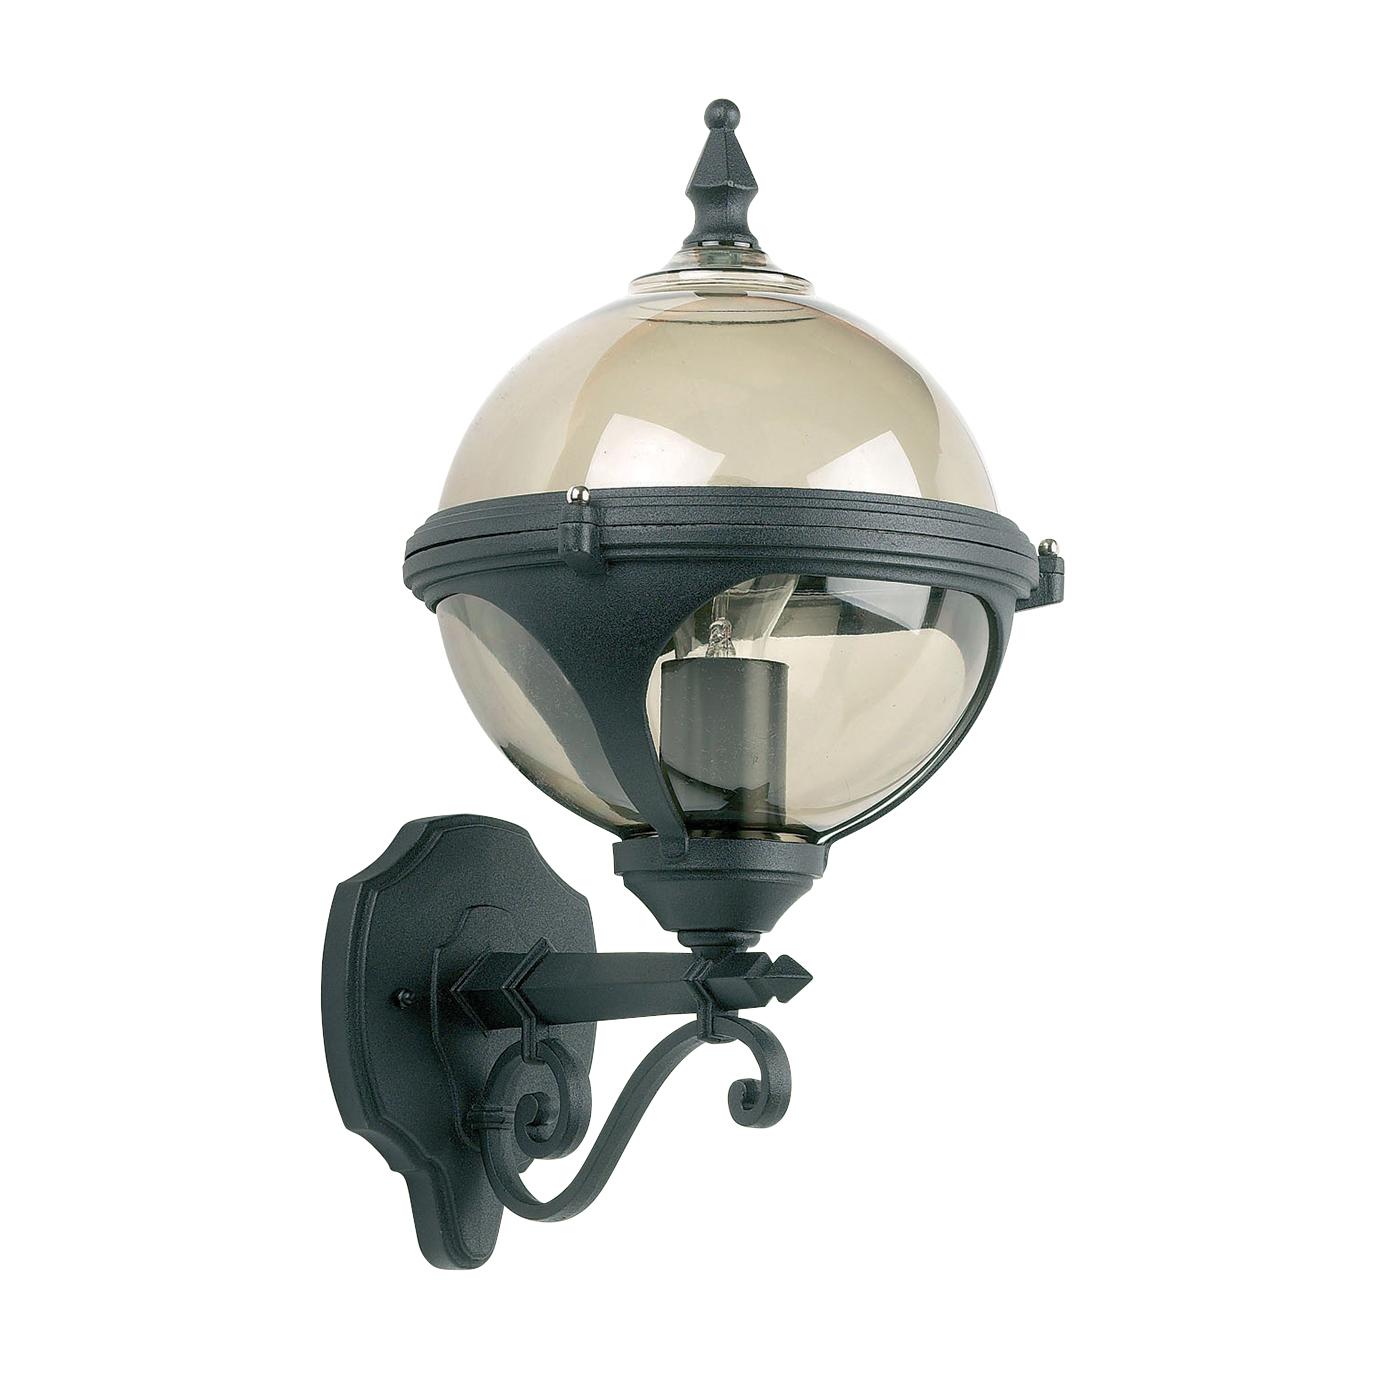 Outdoor Wall Light Accessories: Endon Chatsworth Outdoor Wall Light IP44 60W Matt Black